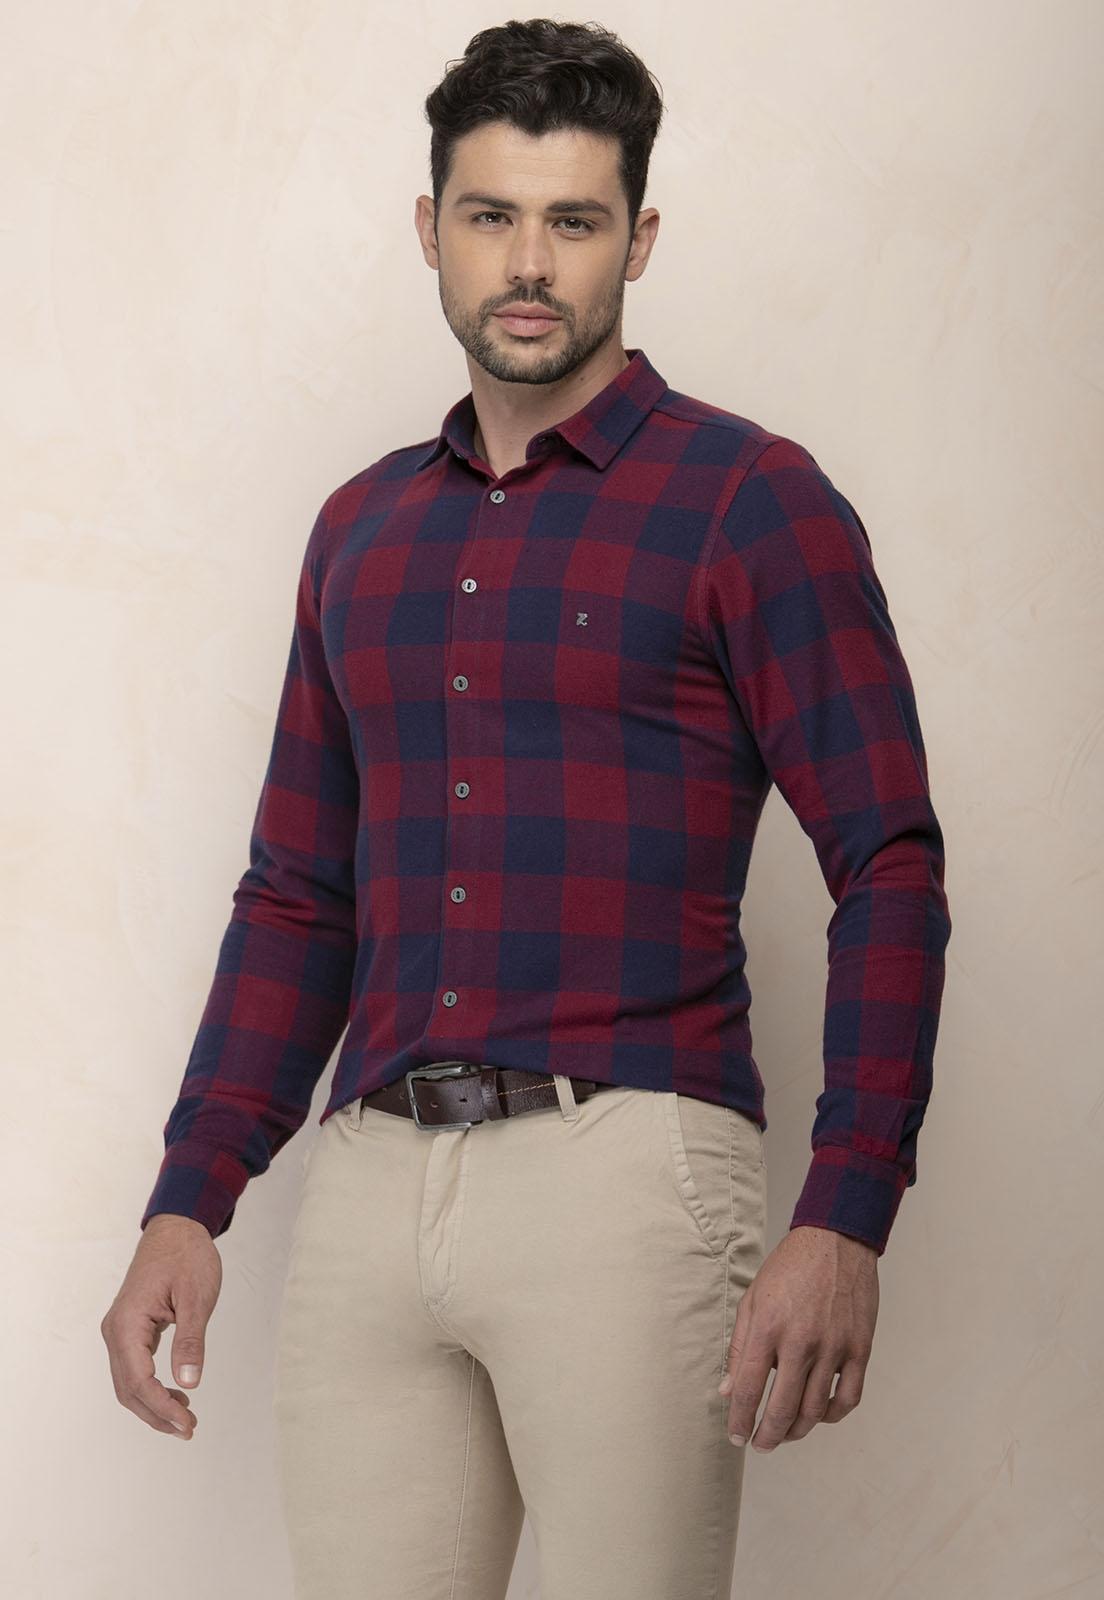 Camisa Social Slim Zaiko Flanela Xadrez Manga Longa 2461